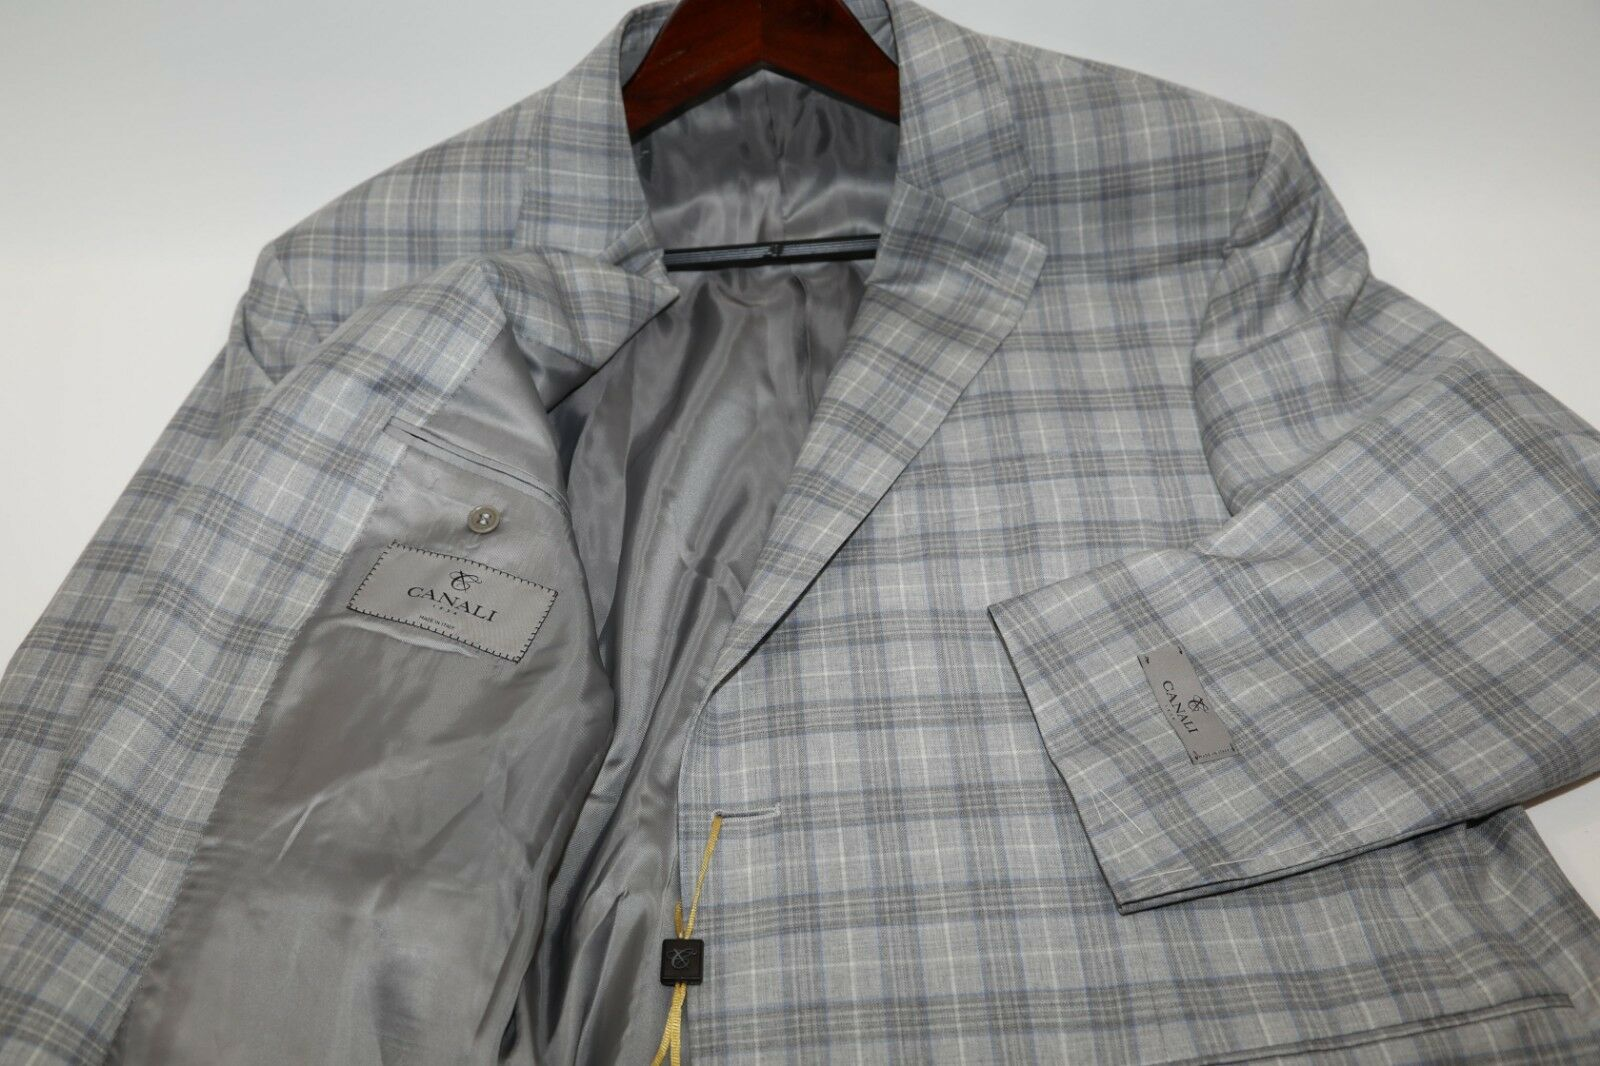 53 CANALI  13290 Plaid Fabric Blazer Größe 48 R